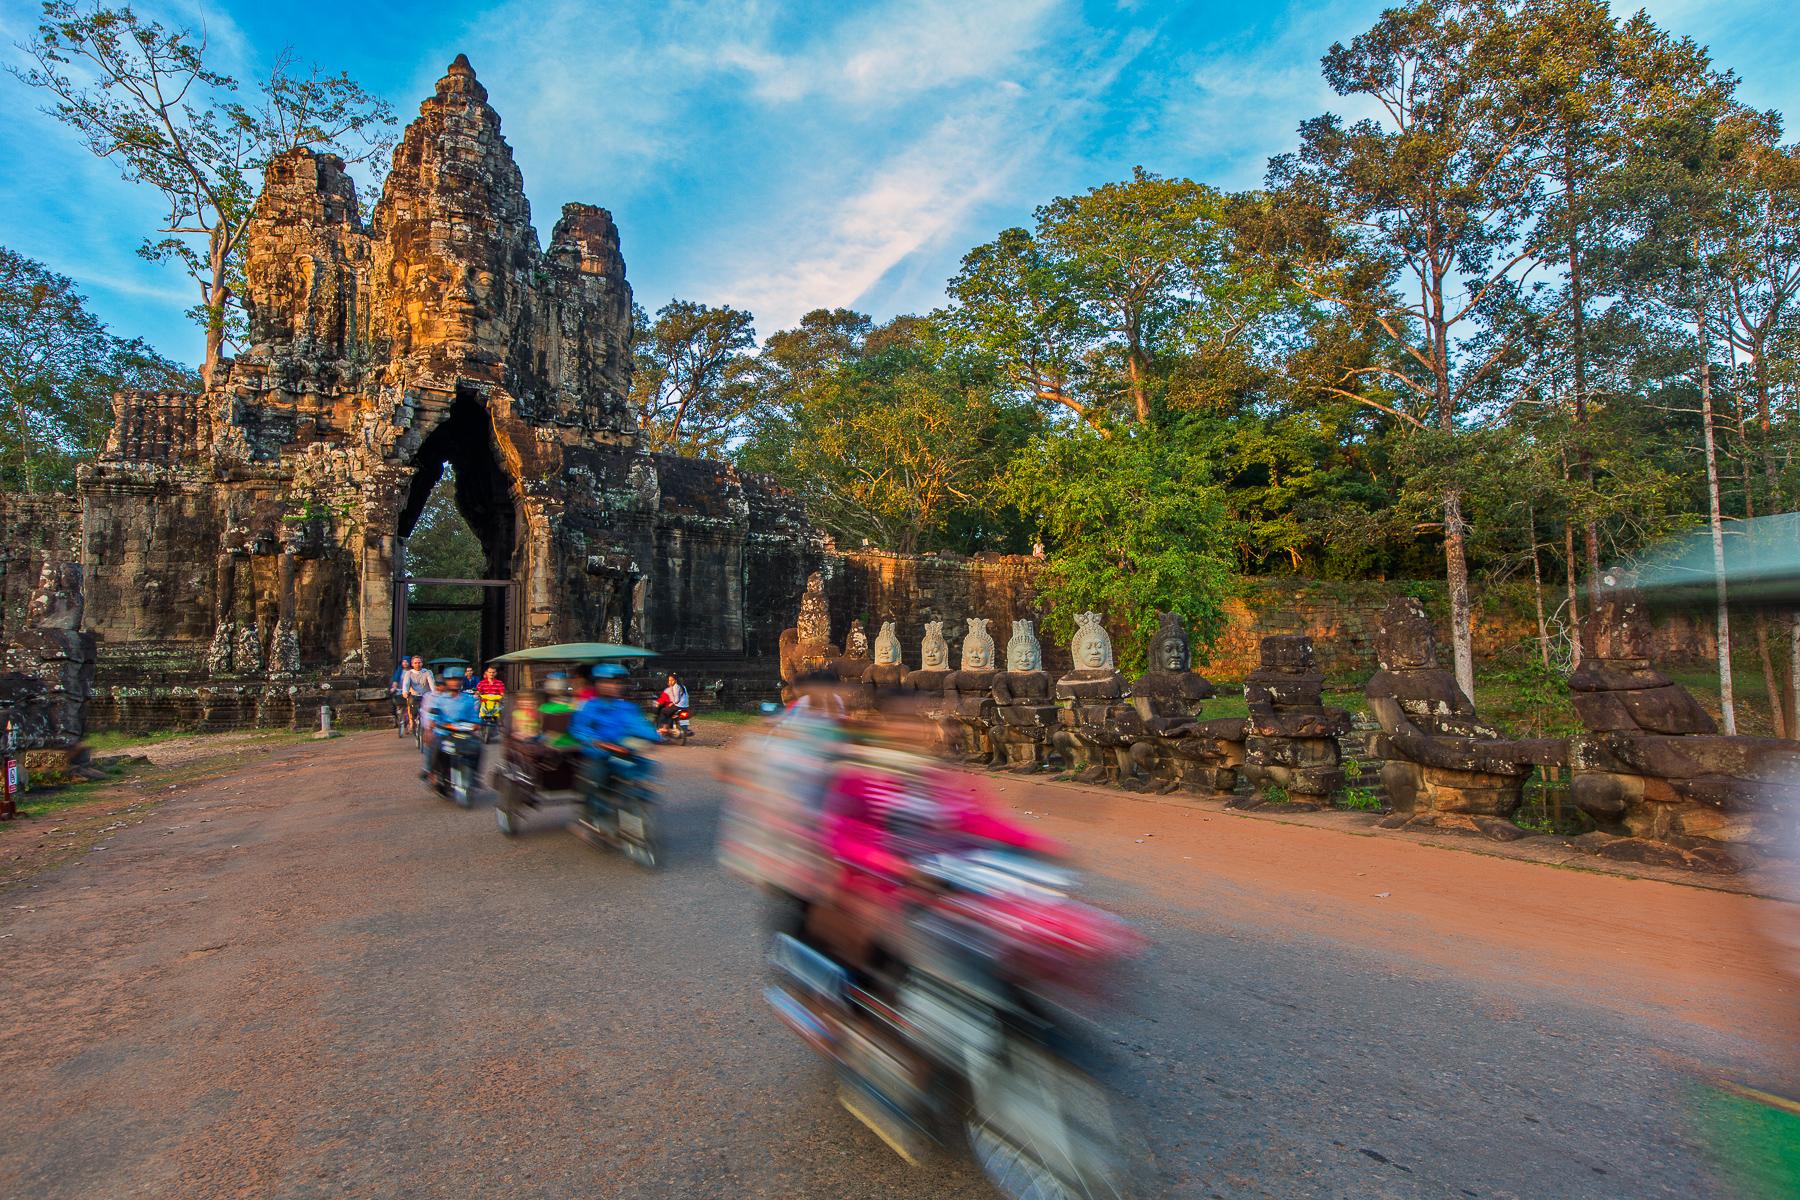 Gates of Angkor Wat